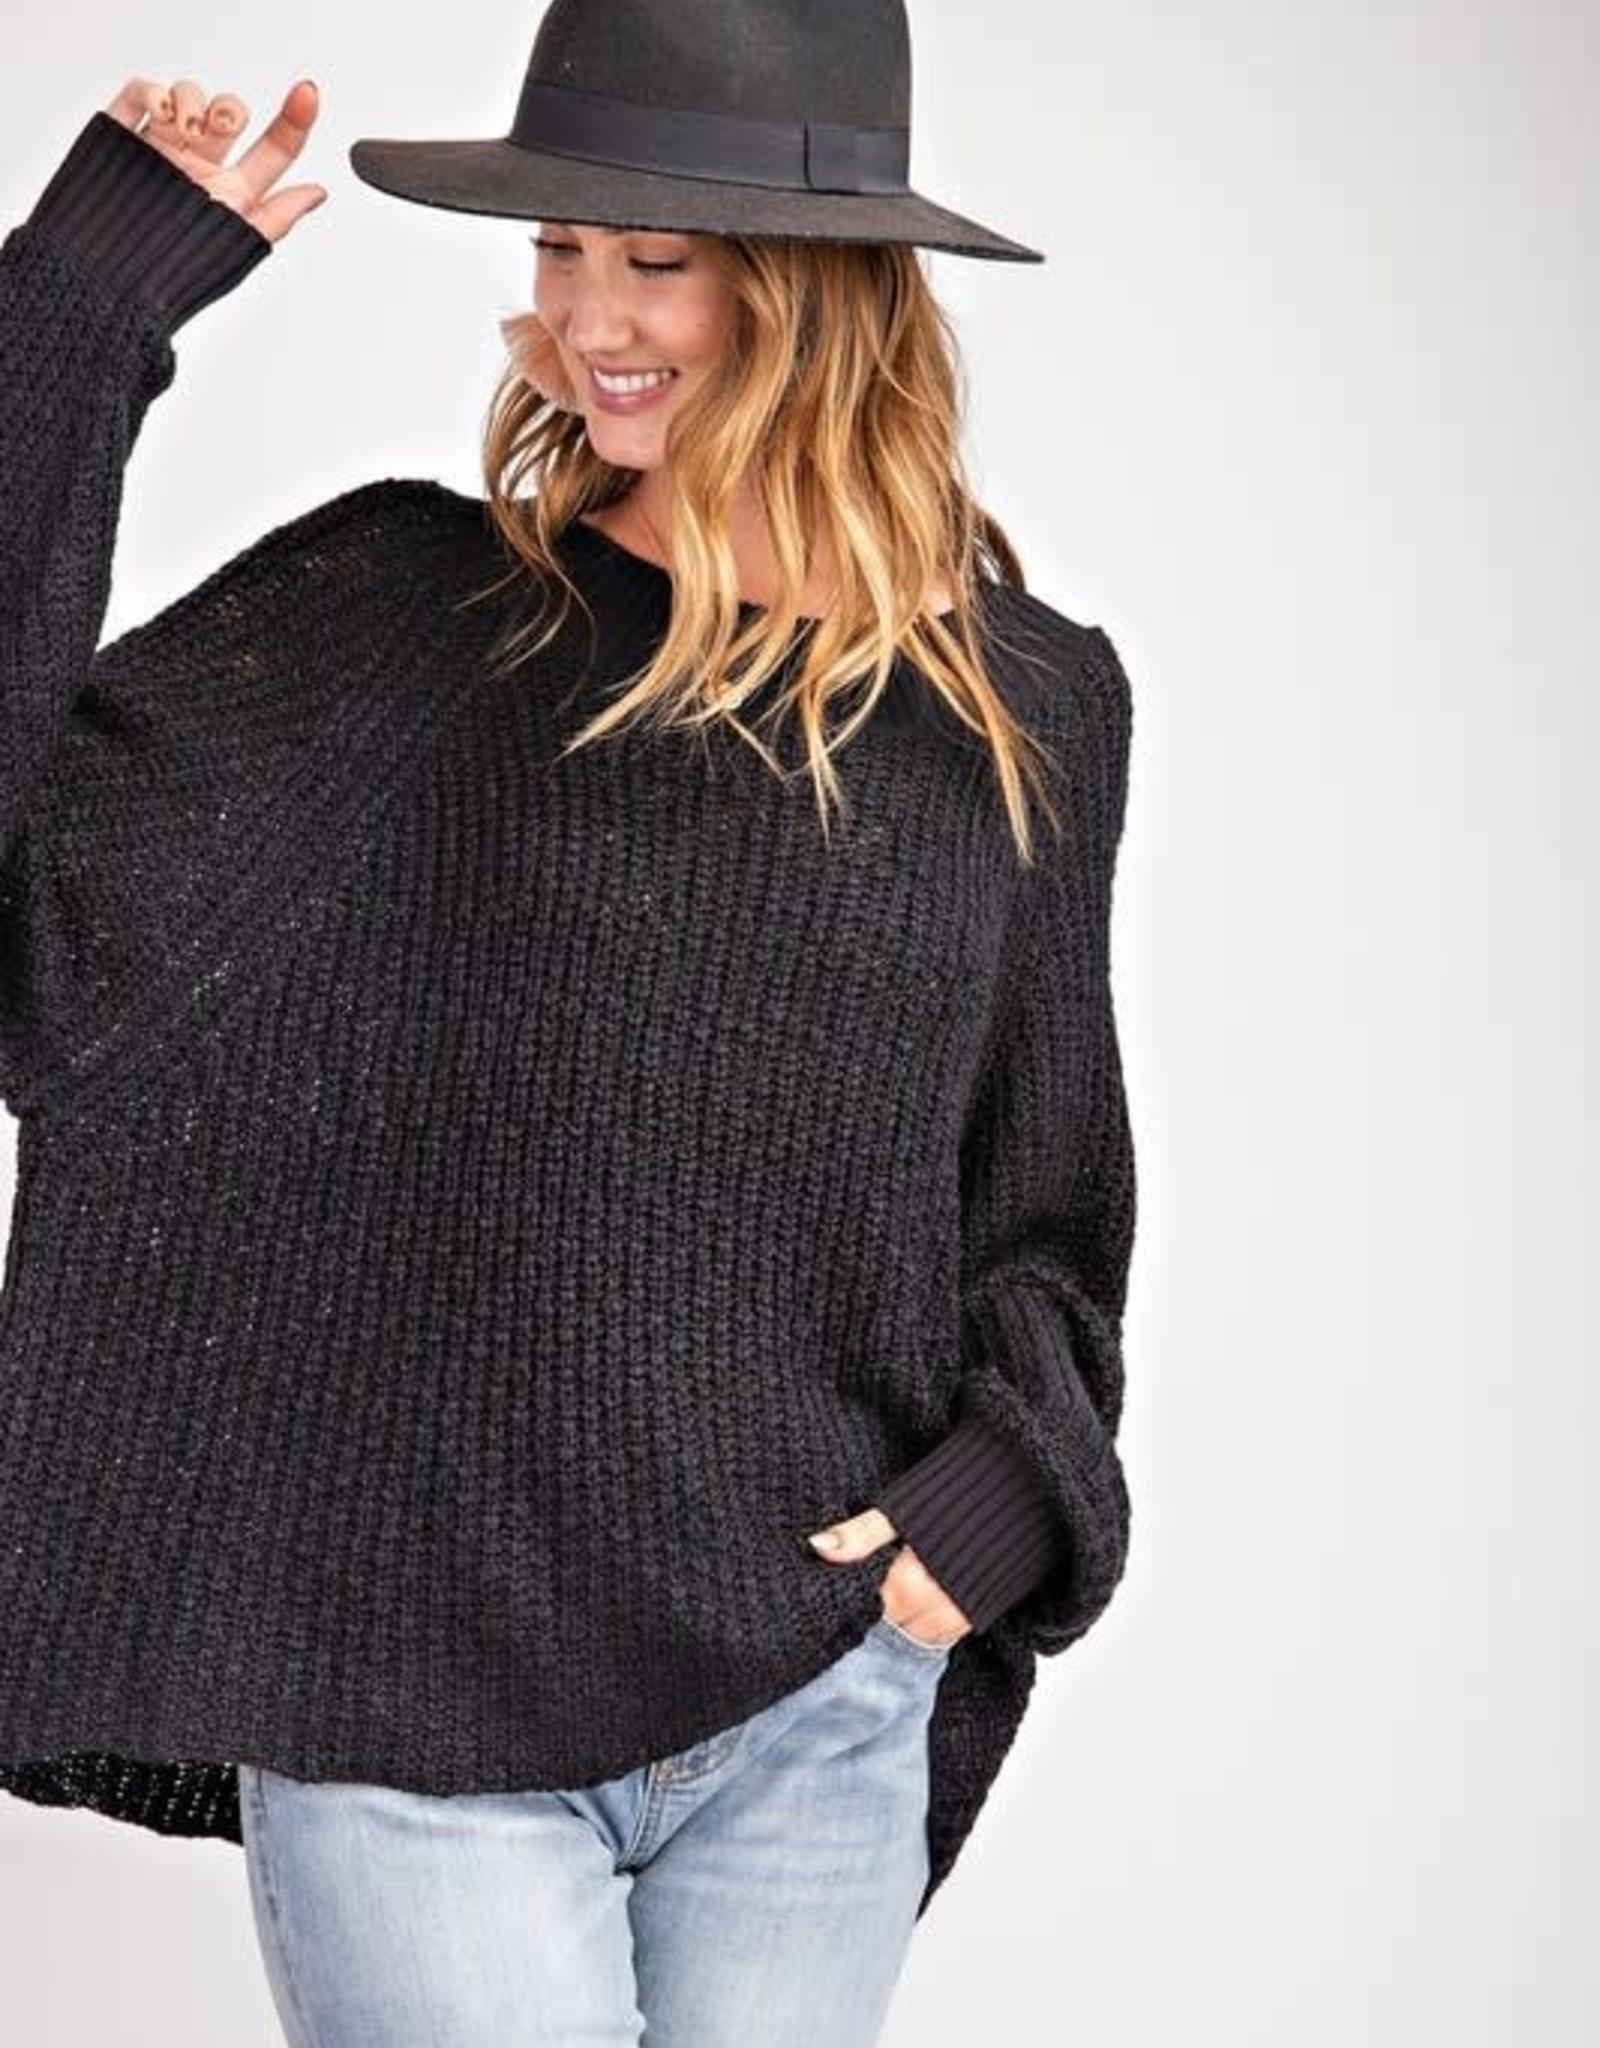 Movie Night Sweater